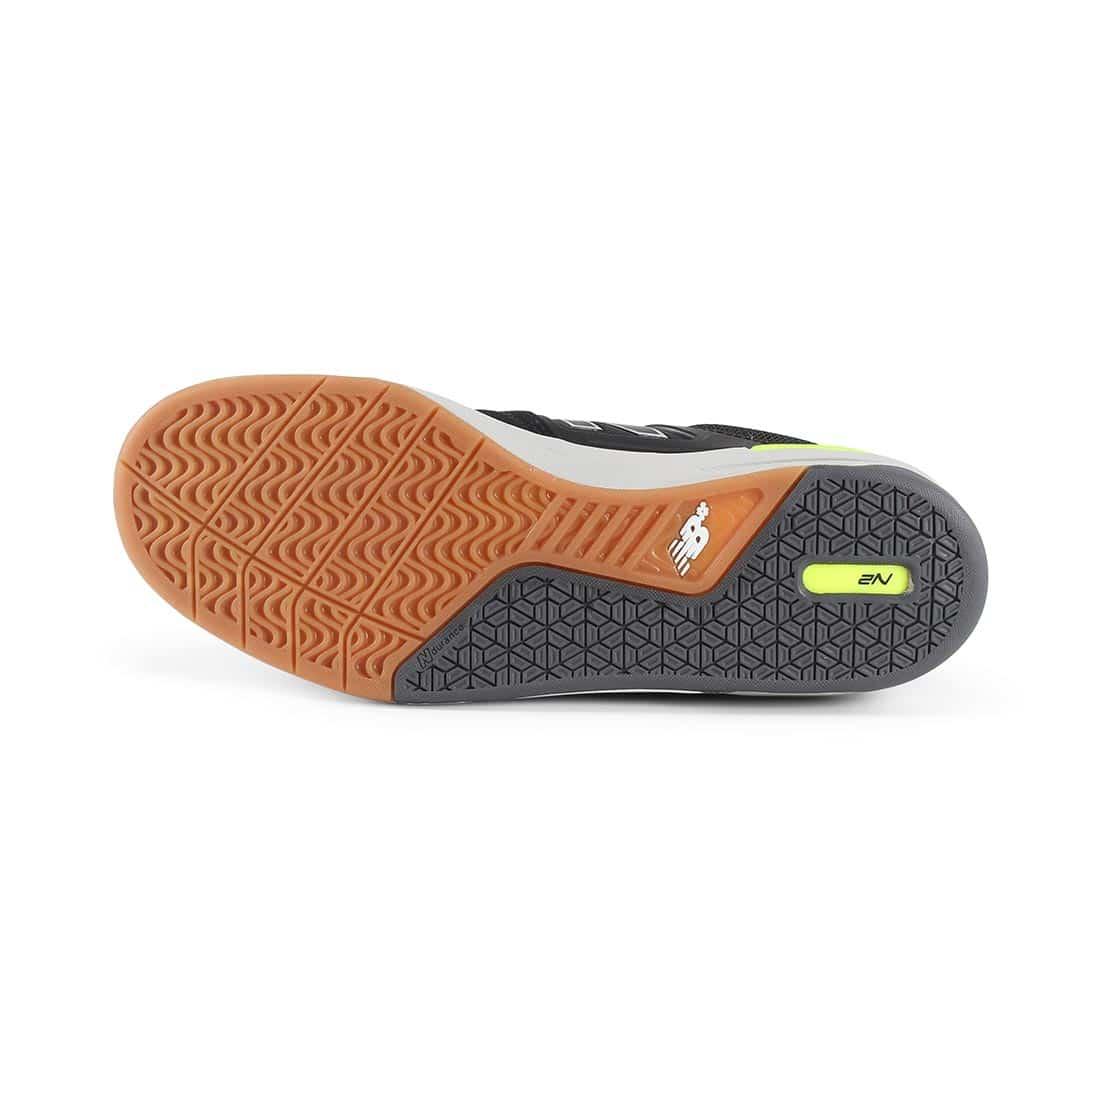 New Balance Numeric 913 Shoes - Black / Grey / Hi Lite